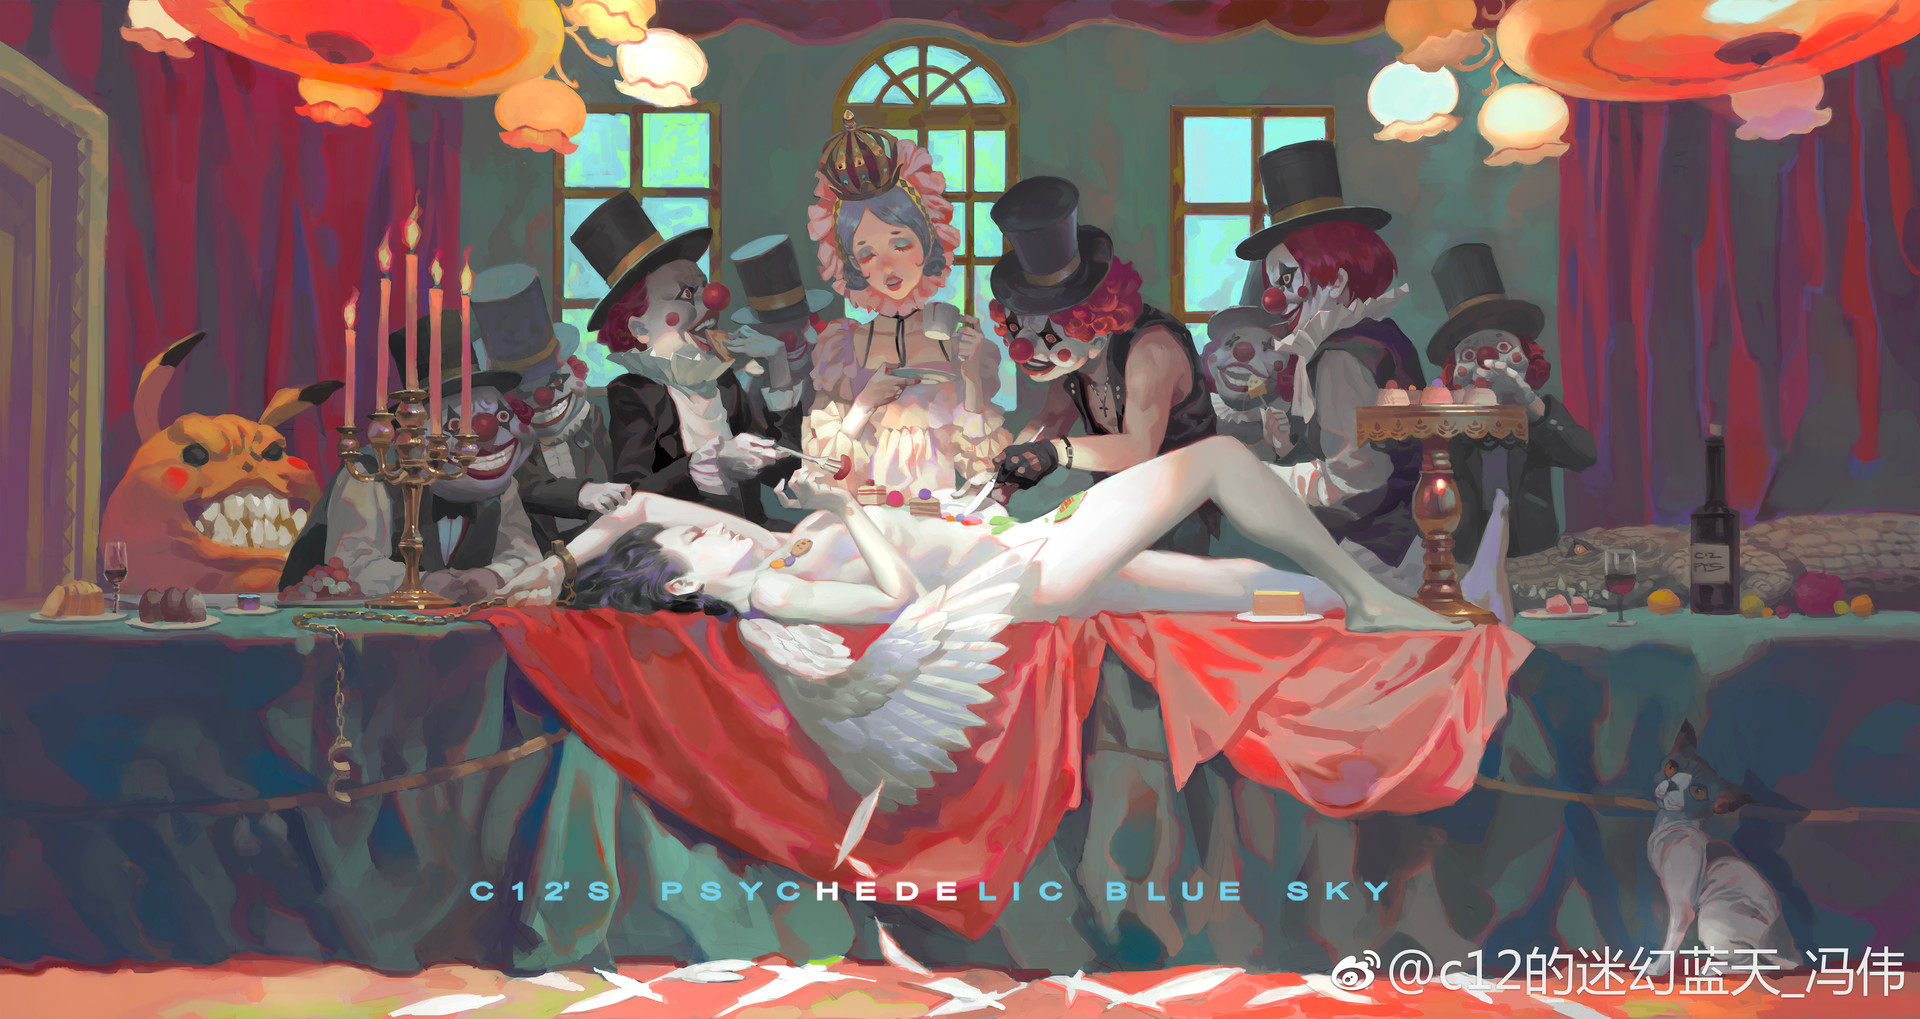 Wei feng 0915